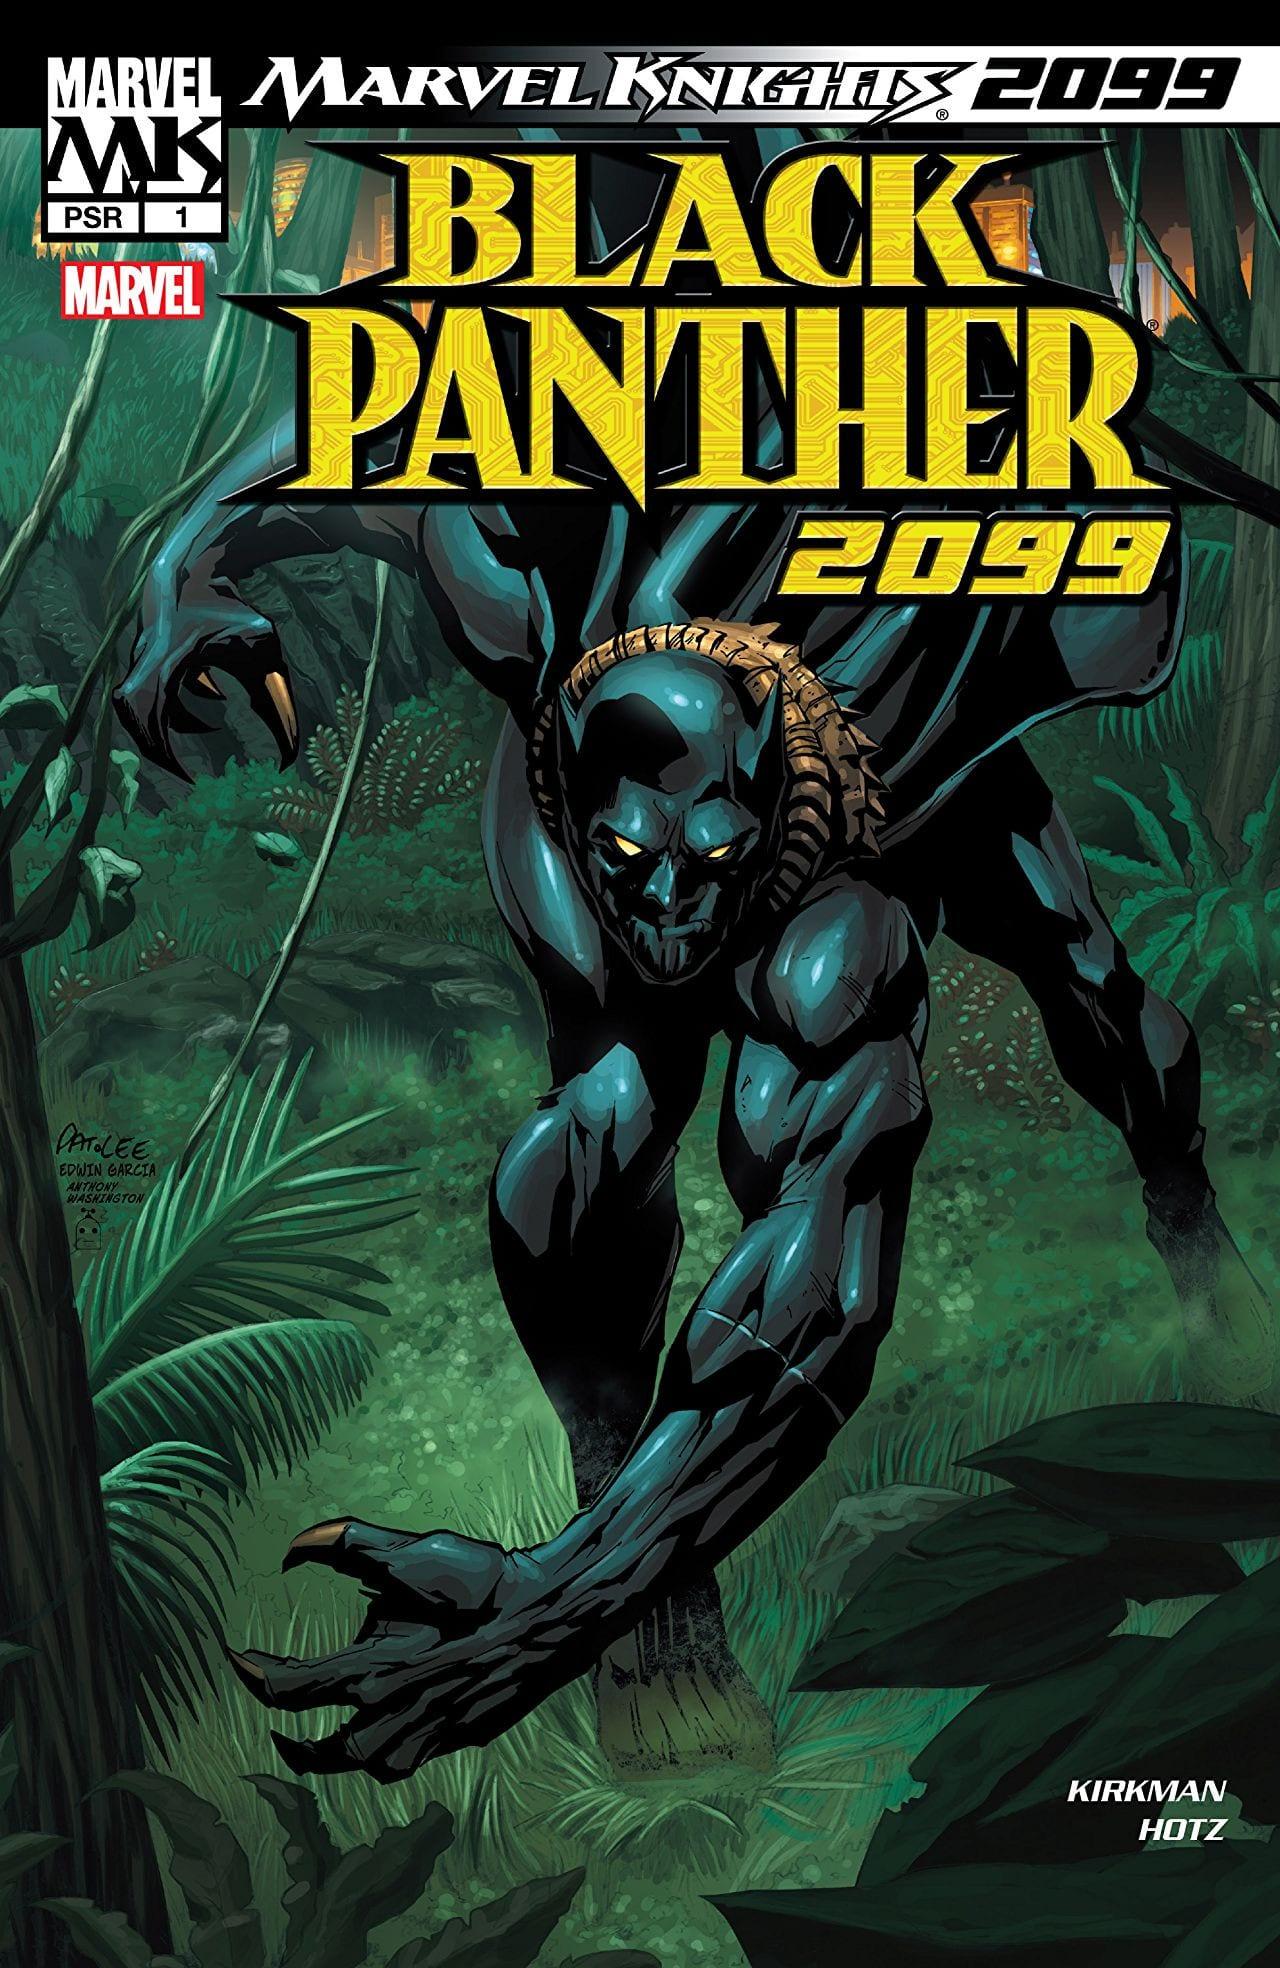 Comic completo Black Panther 2099 Volumen 1